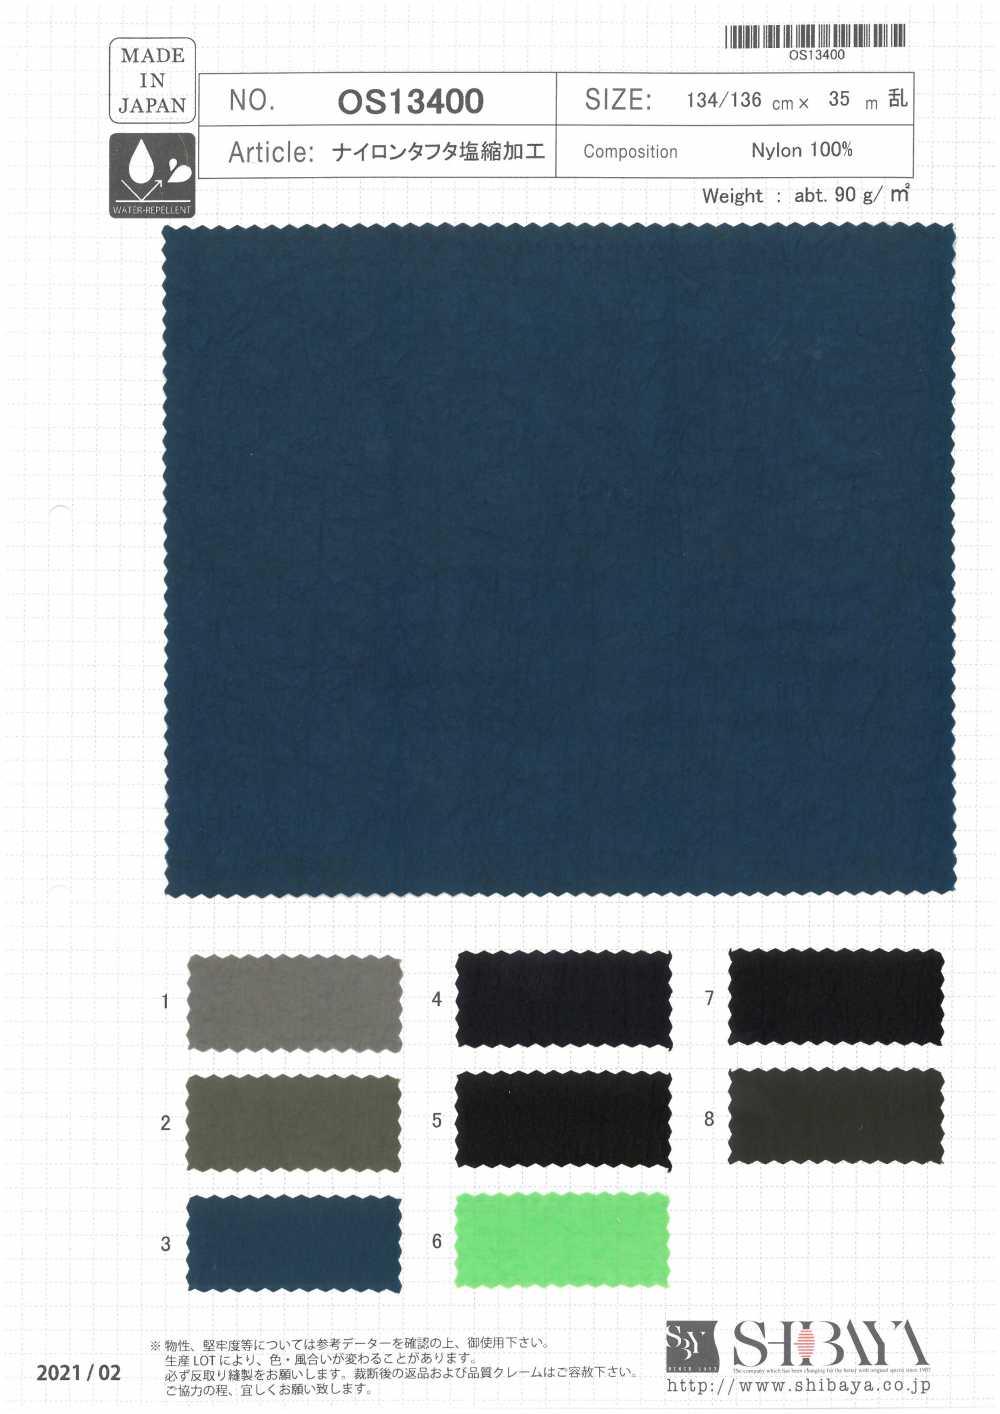 OS13400 ナイロンタフタ塩縮加工[生地] 柴屋/オークラ商事 - ApparelX アパレル資材卸通販